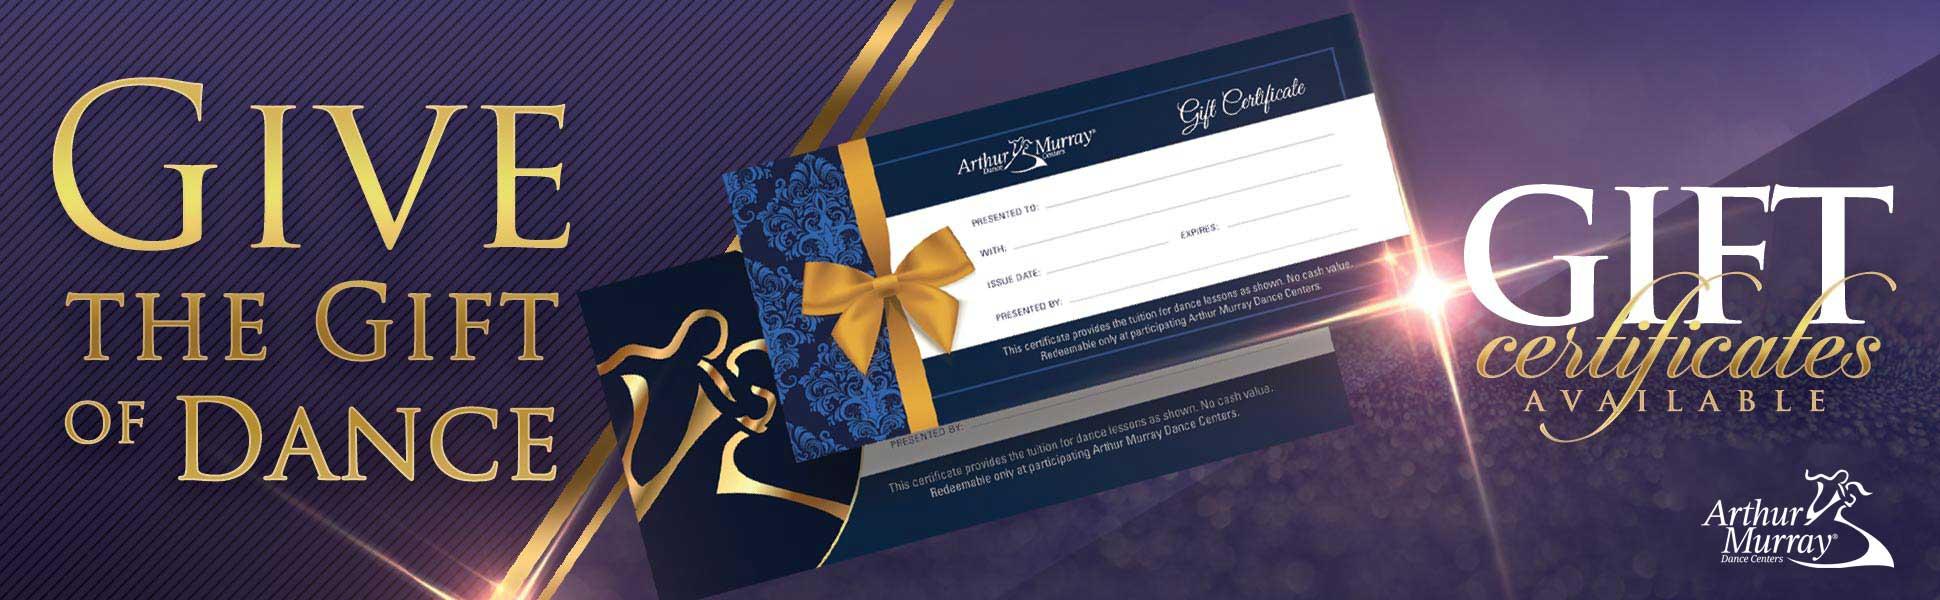 Arthur Murray Plano Gift Certificates